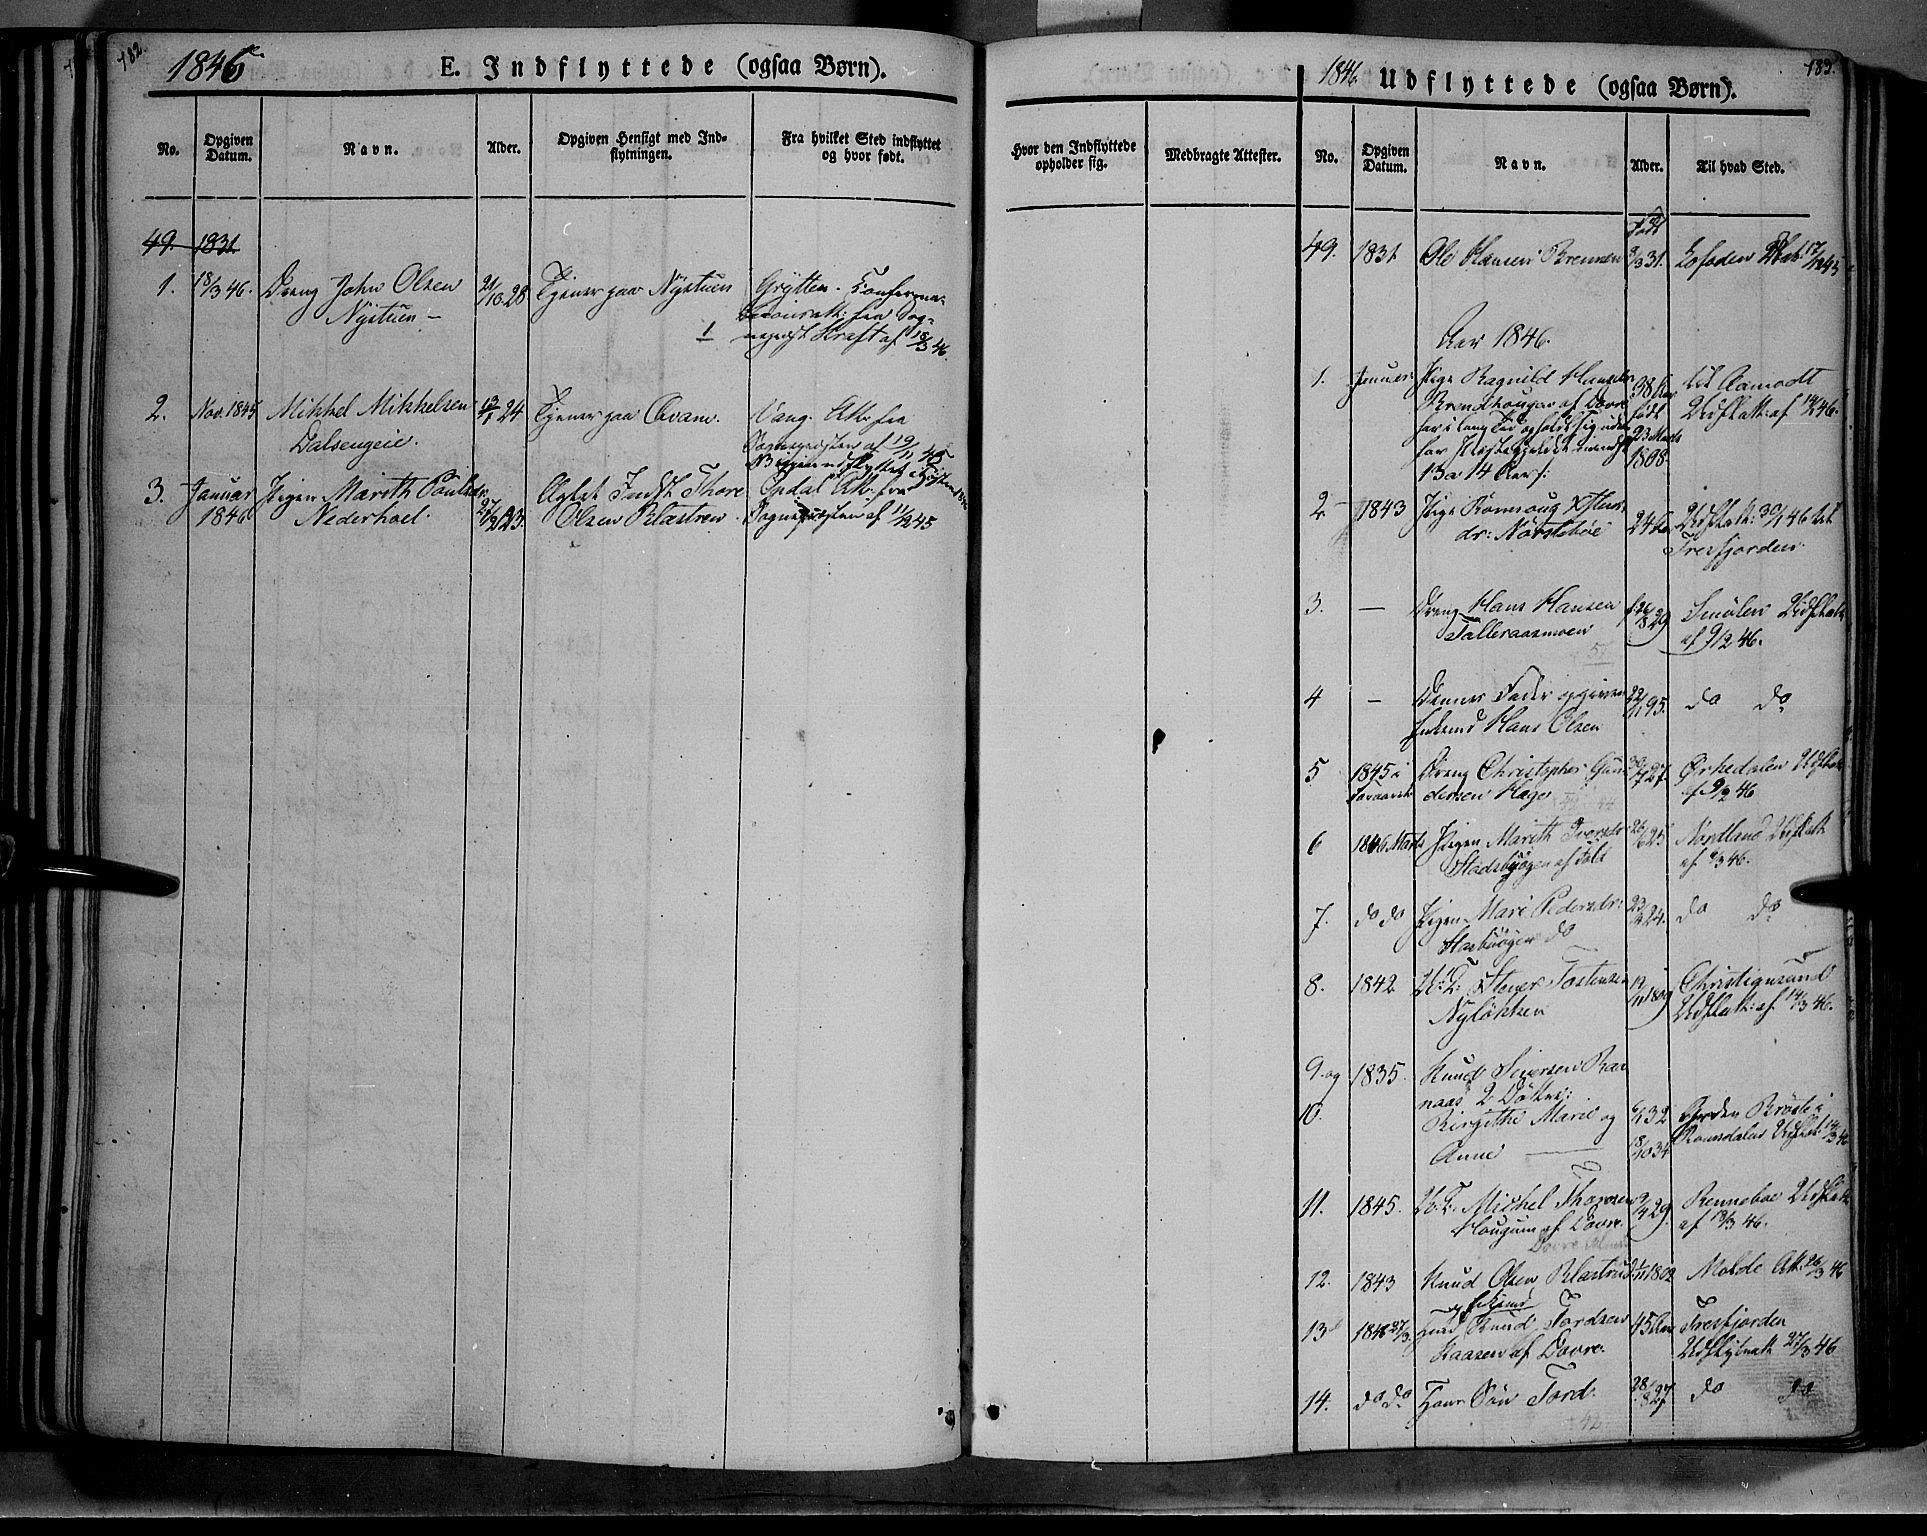 SAH, Lesja prestekontor, Ministerialbok nr. 6B, 1843-1854, s. 782-783